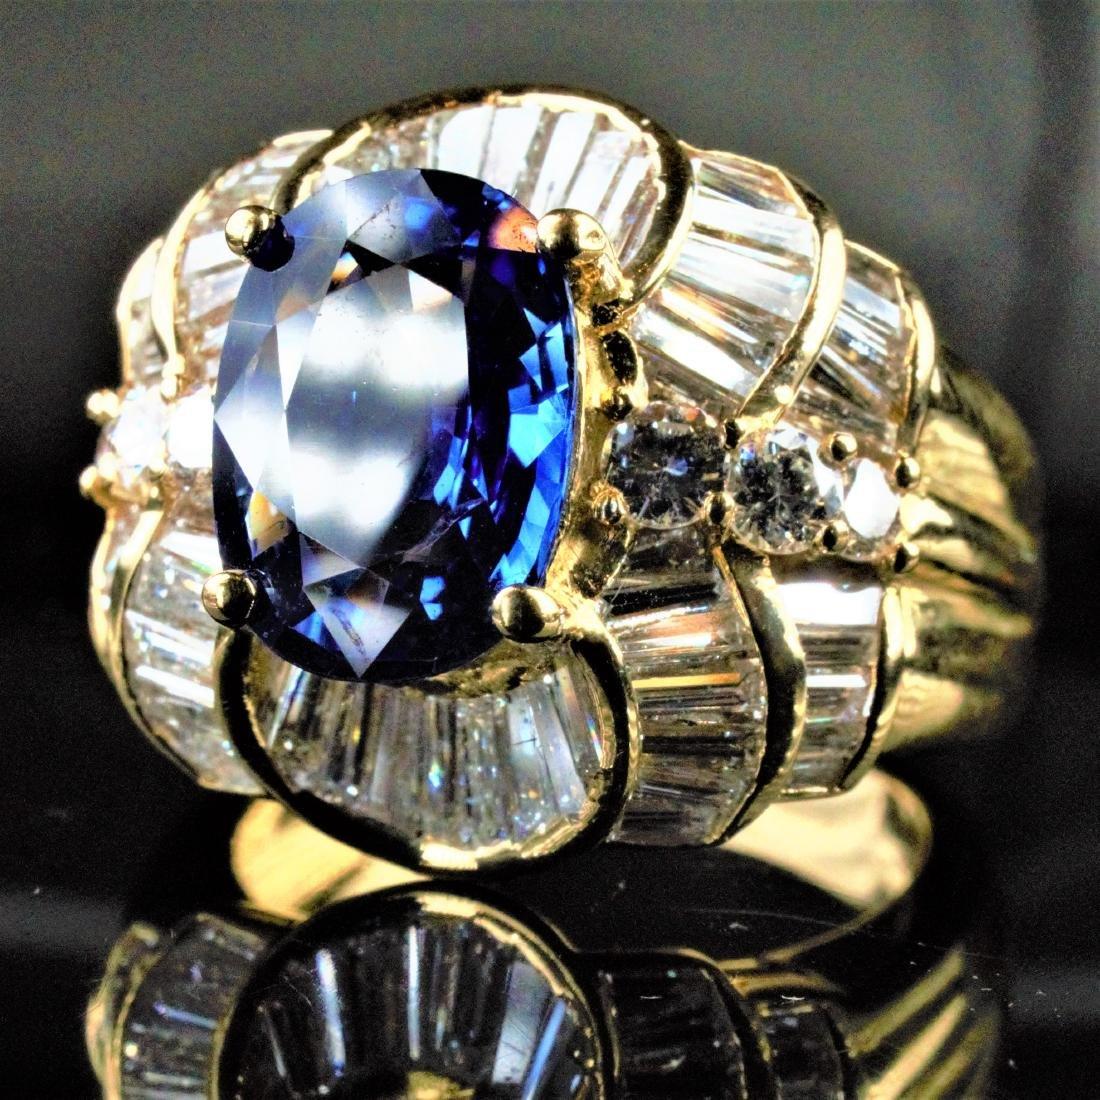 14k YG 2.25 CT Sapphire and Diamond Ring sz7